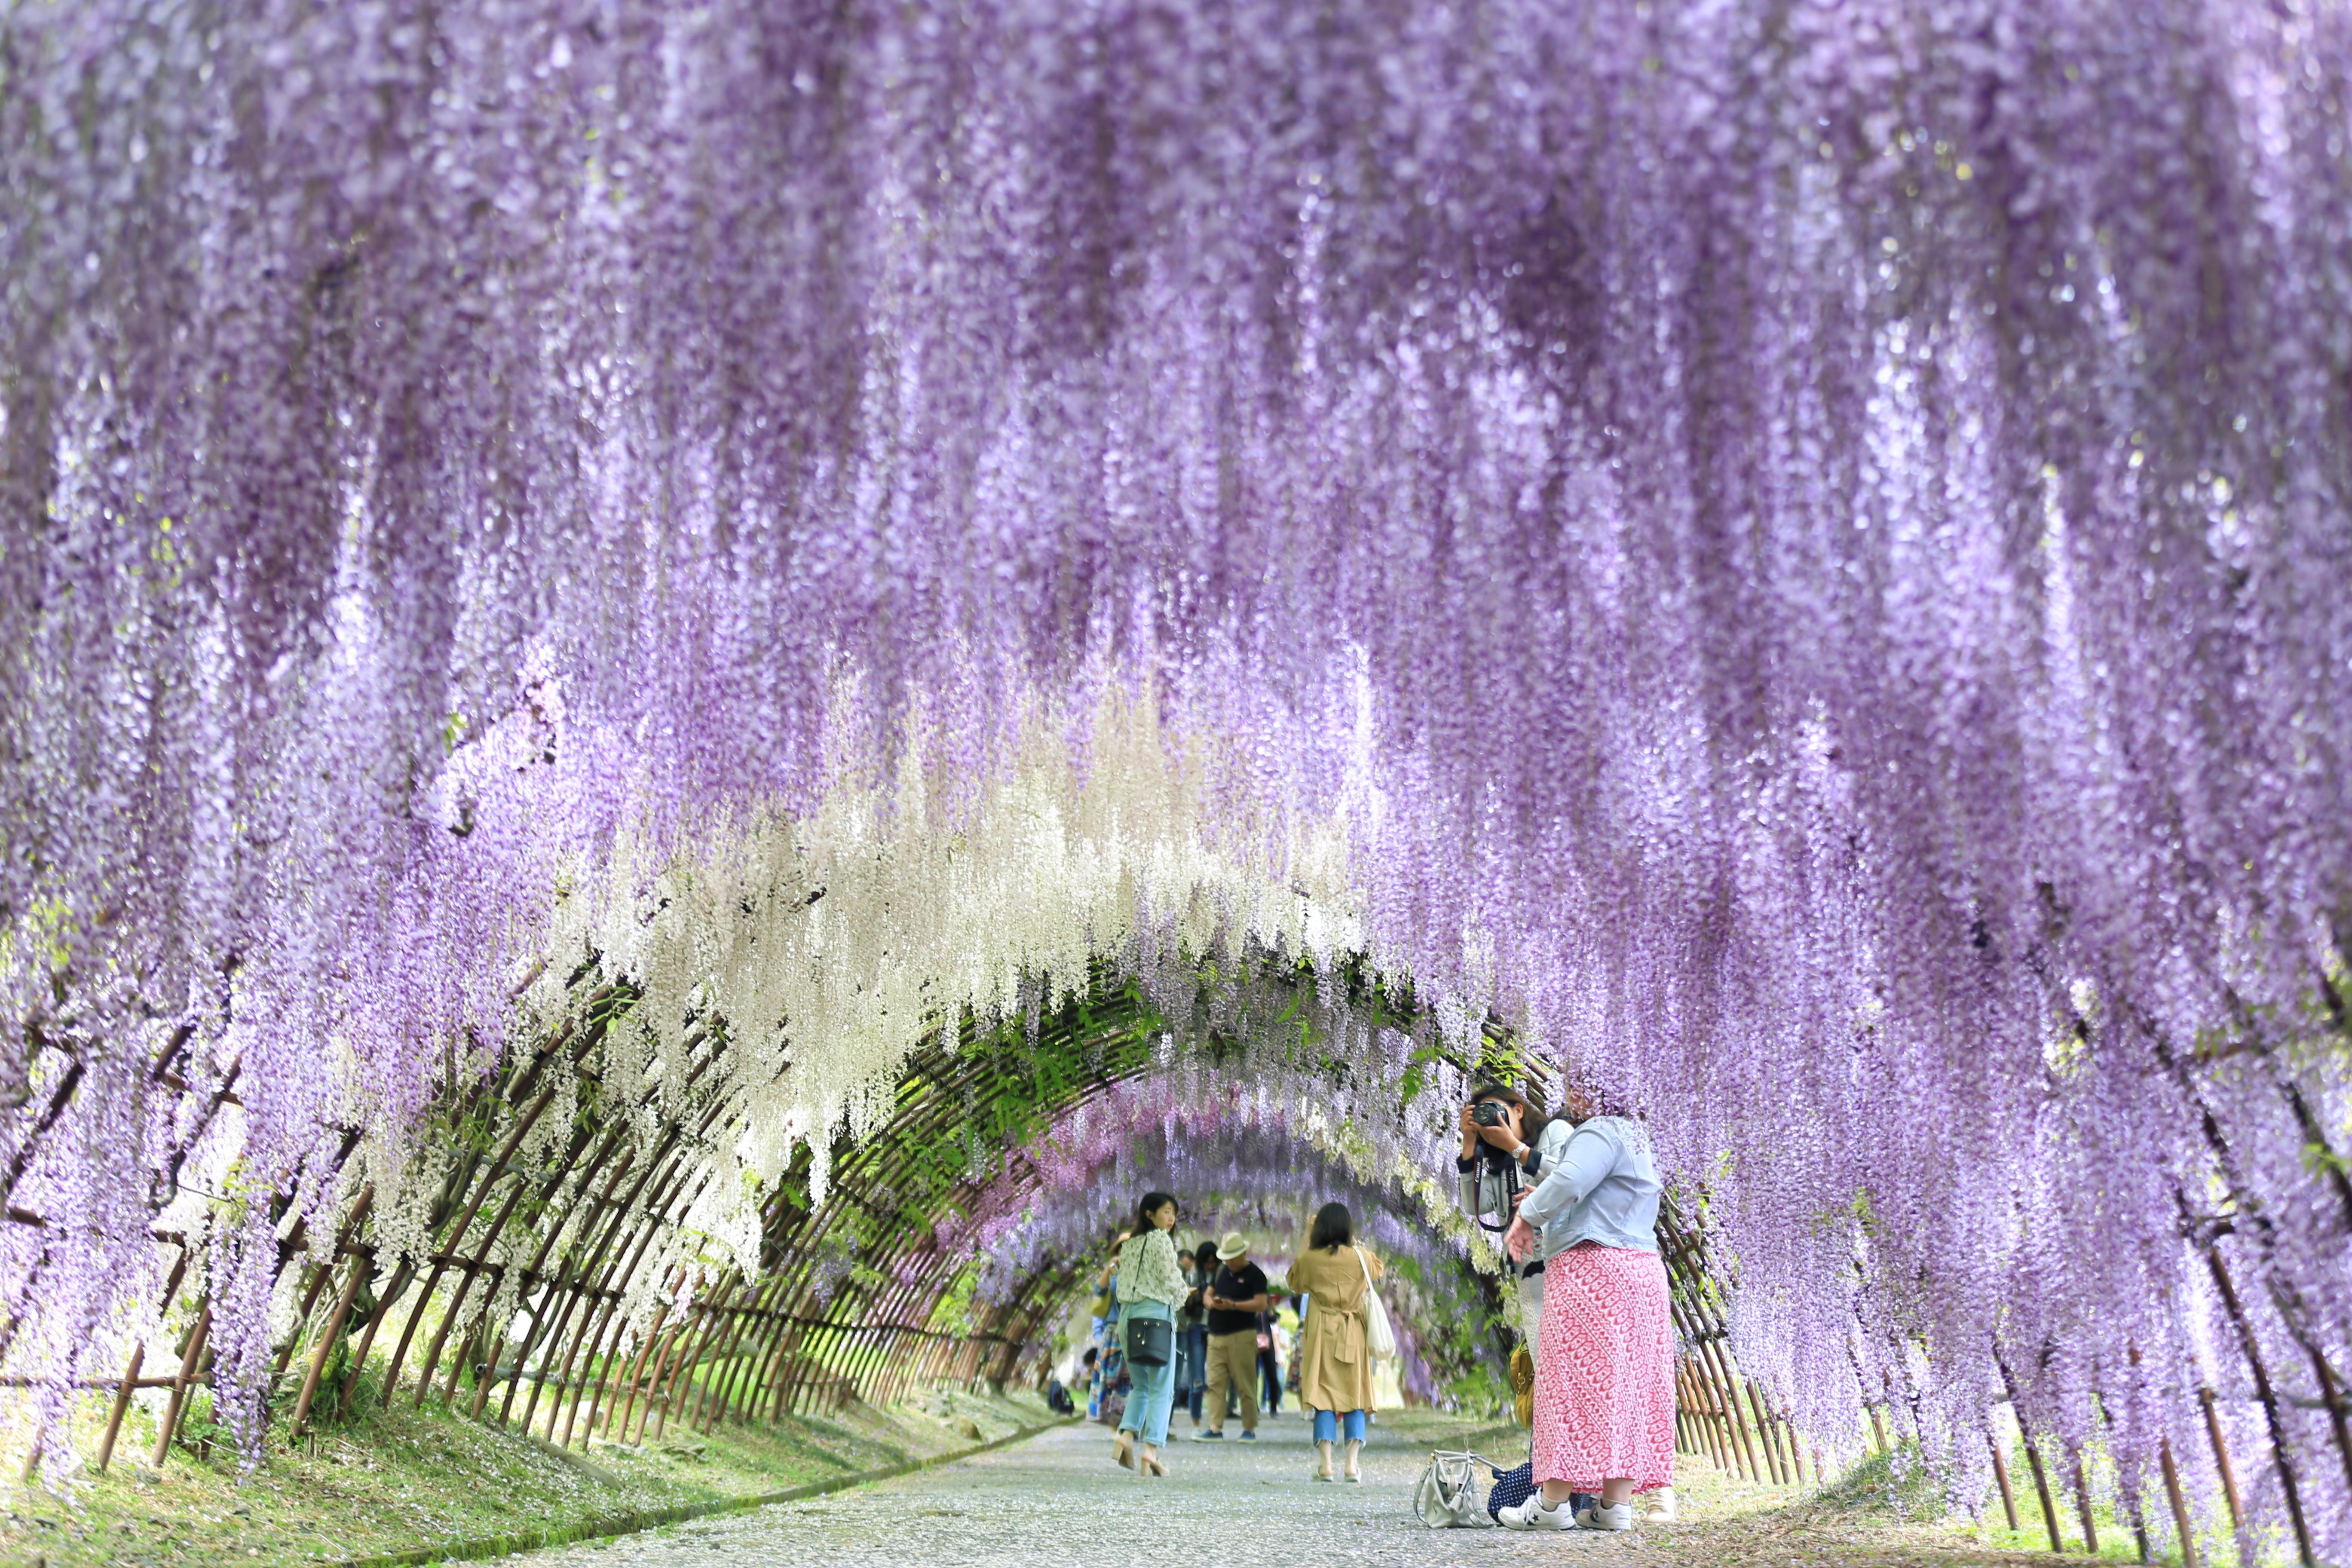 Kawachi Wisteria Garden Travel Guidebook Must Visit Attractions In Kita Kyushu Kawachi Wisteria Garden Nearby Recommendation Trip Com